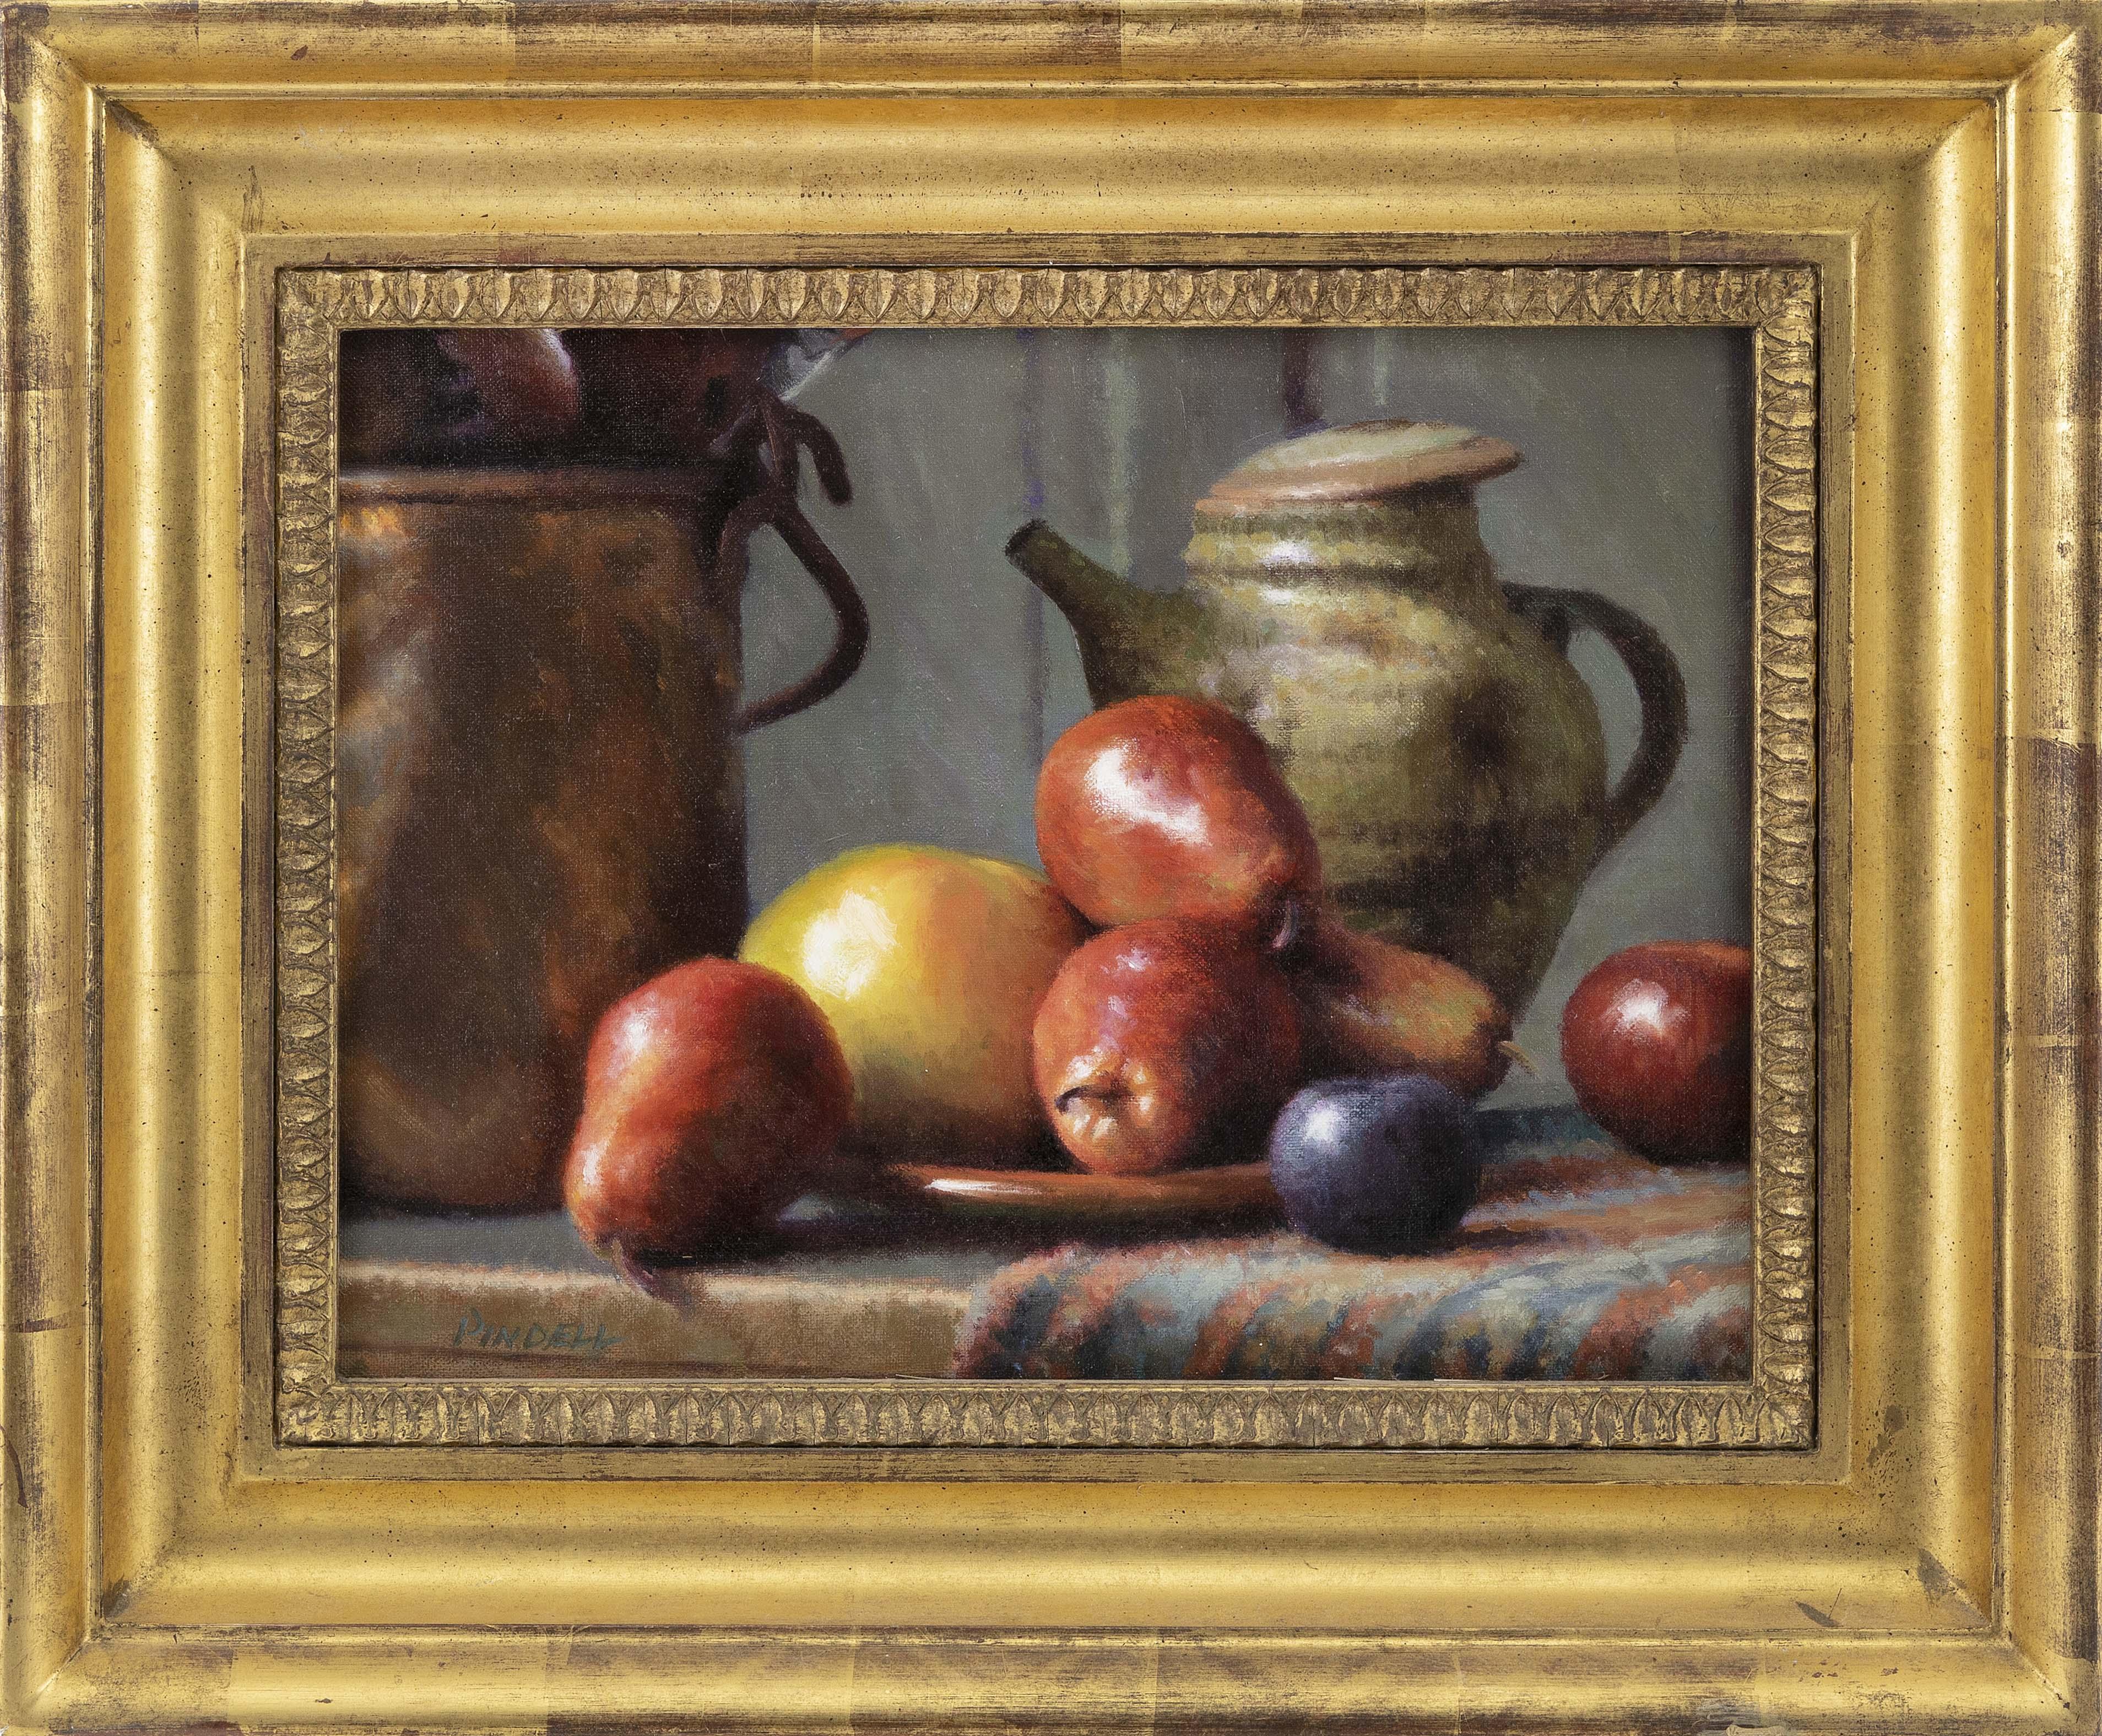 PAMELA PINDELL (Massachusetts, Contemporary), Still life of apples., Oil on canvas, 12